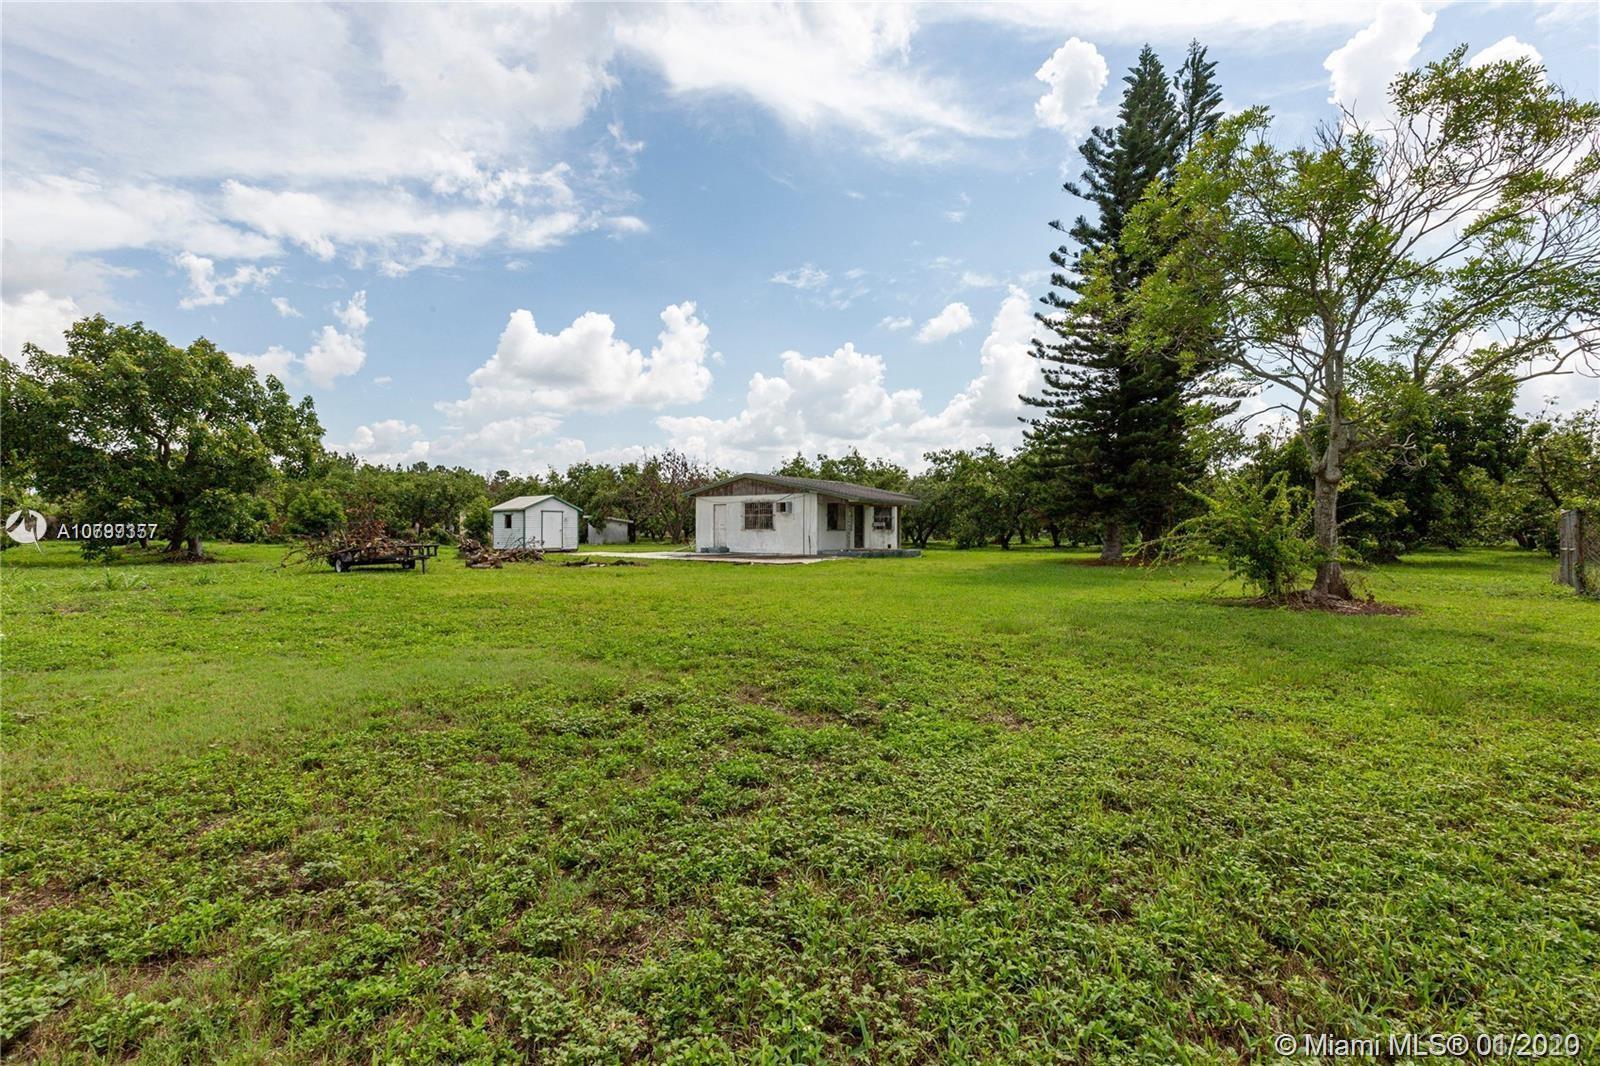 19295 SW 334 St, Homestead, FL 33034 - Homestead, FL real estate listing